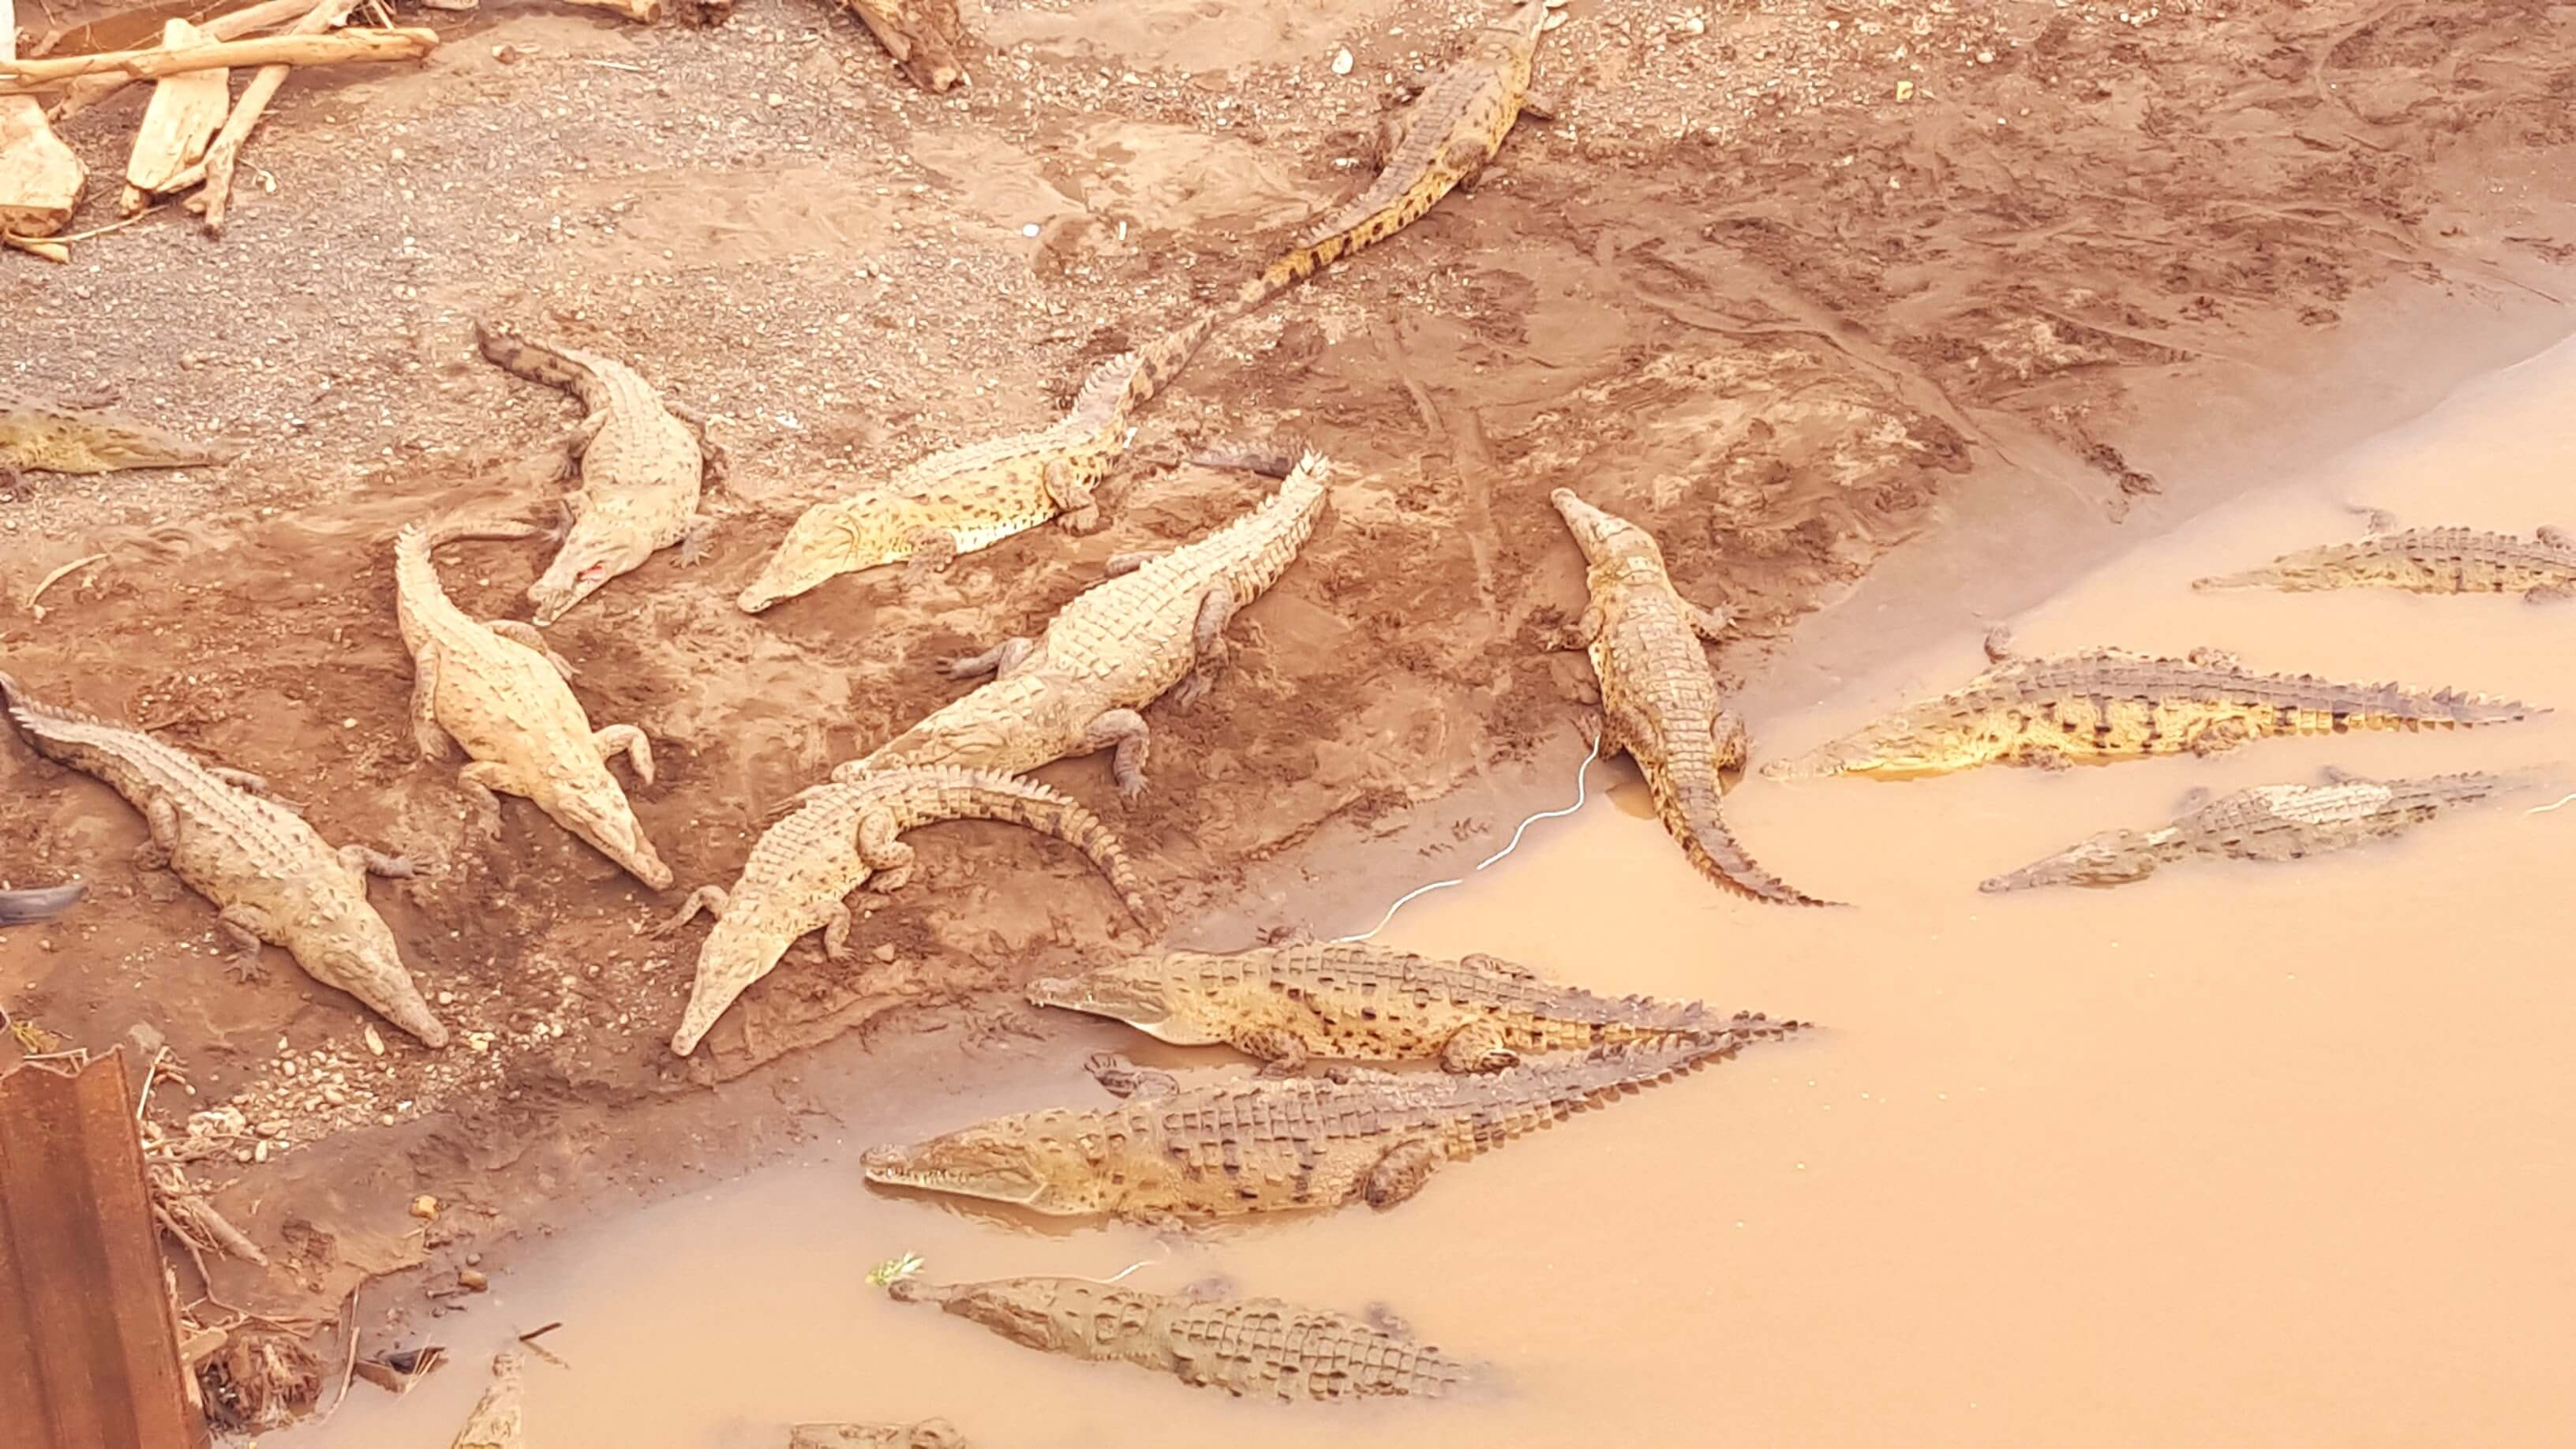 An image showing where to find crocodiles in Costa Rica at Rio Tarcoles bridge near Jaco